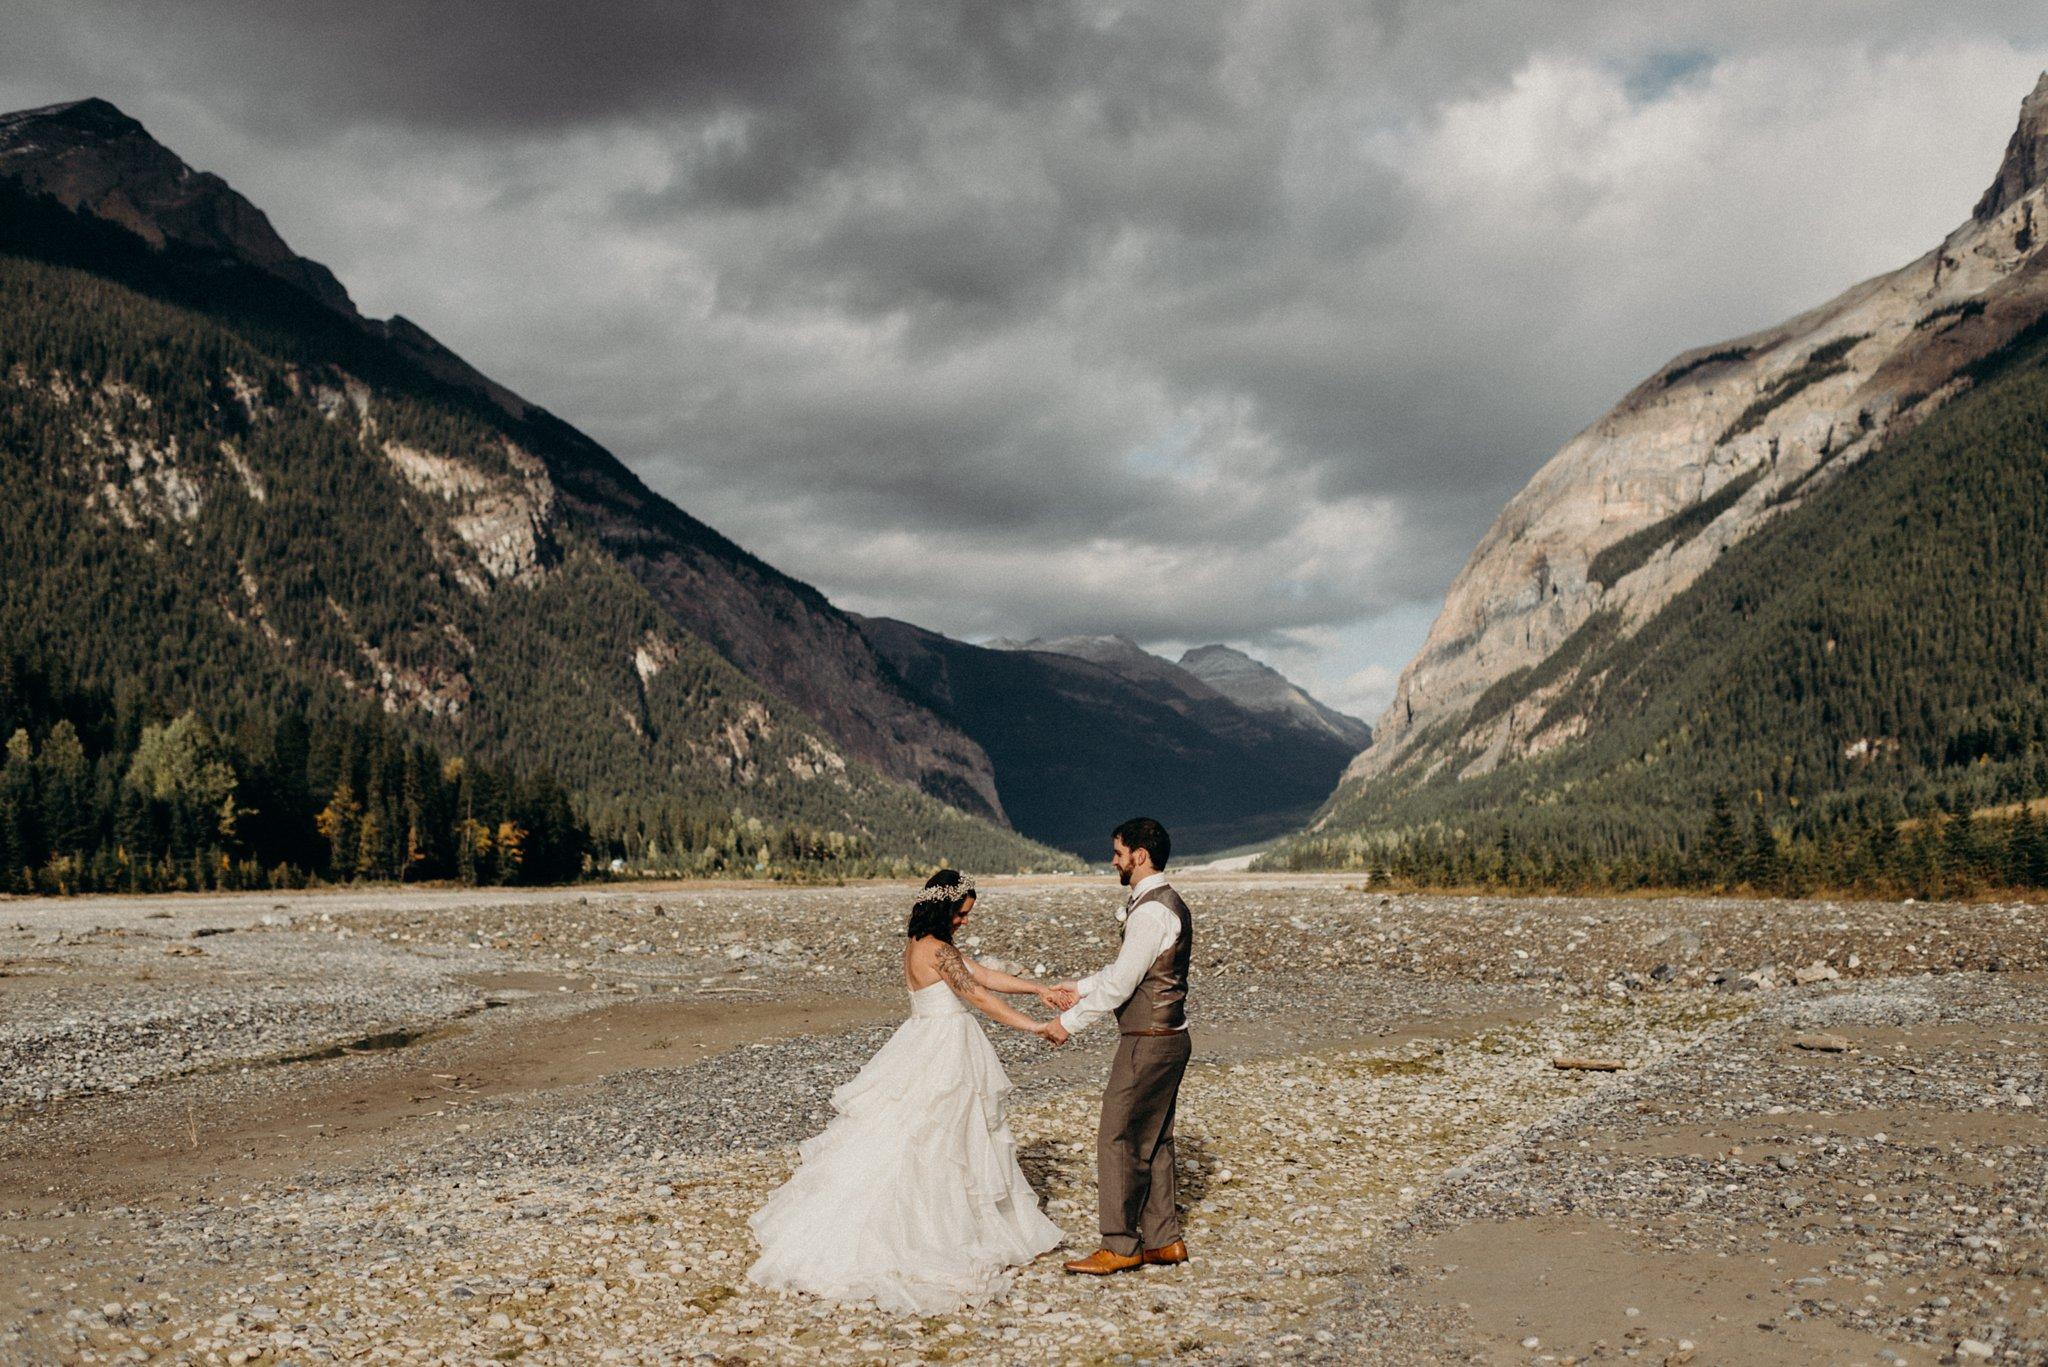 kaihla_tonai_intimate_wedding_elopement_photographer_6906.jpg